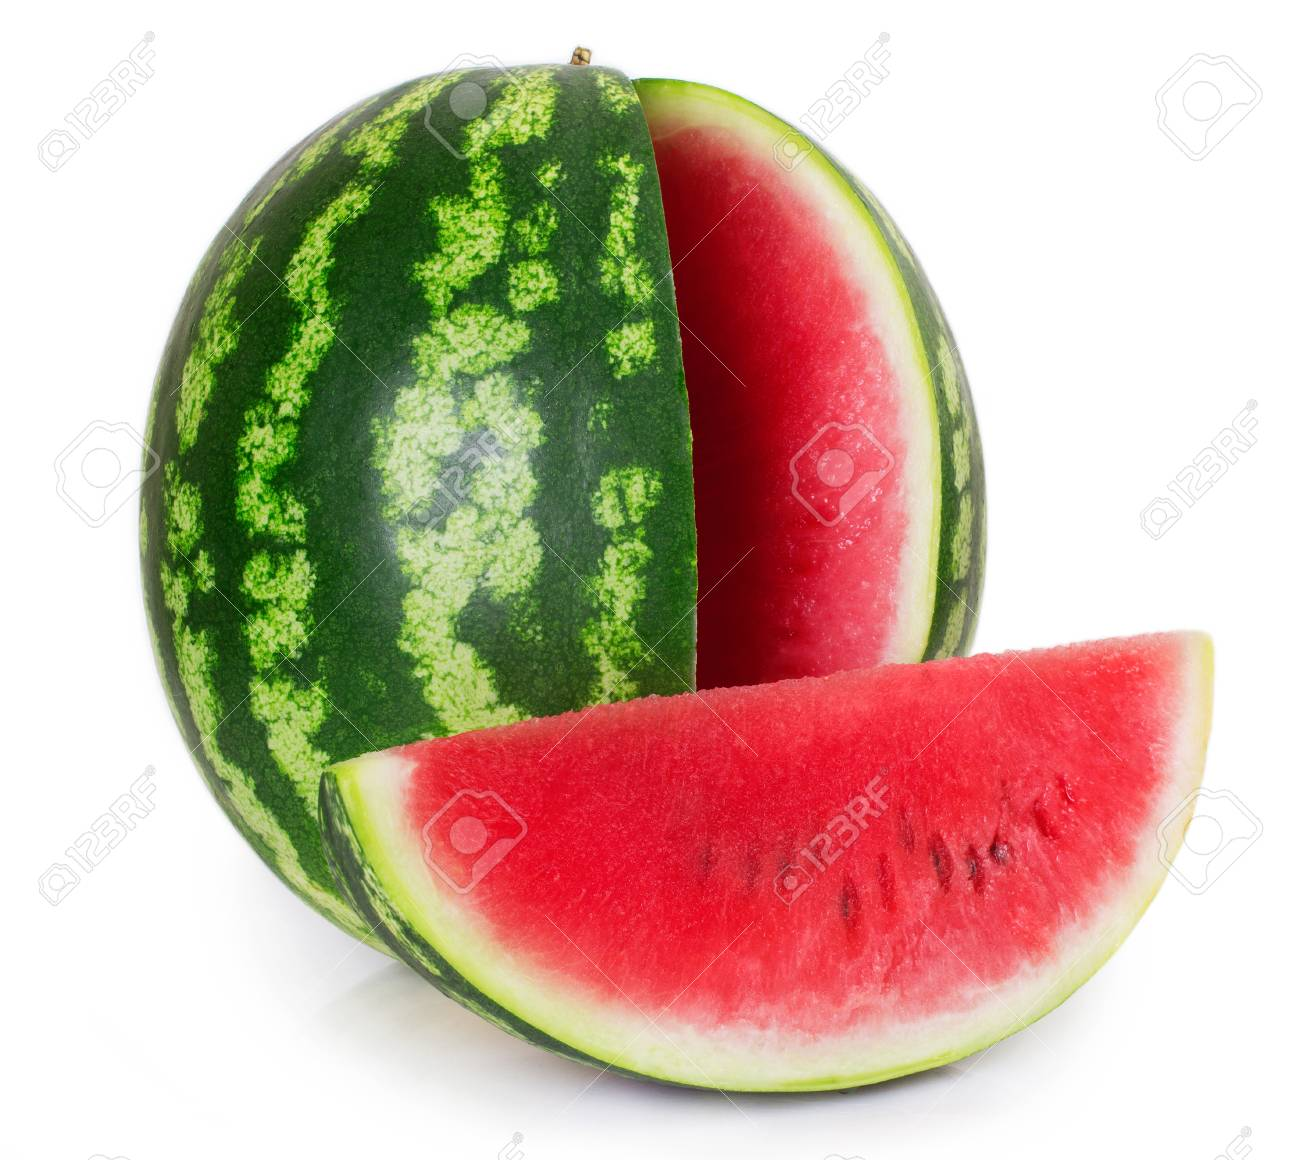 fresh watermelon isolated on white background - 125370157